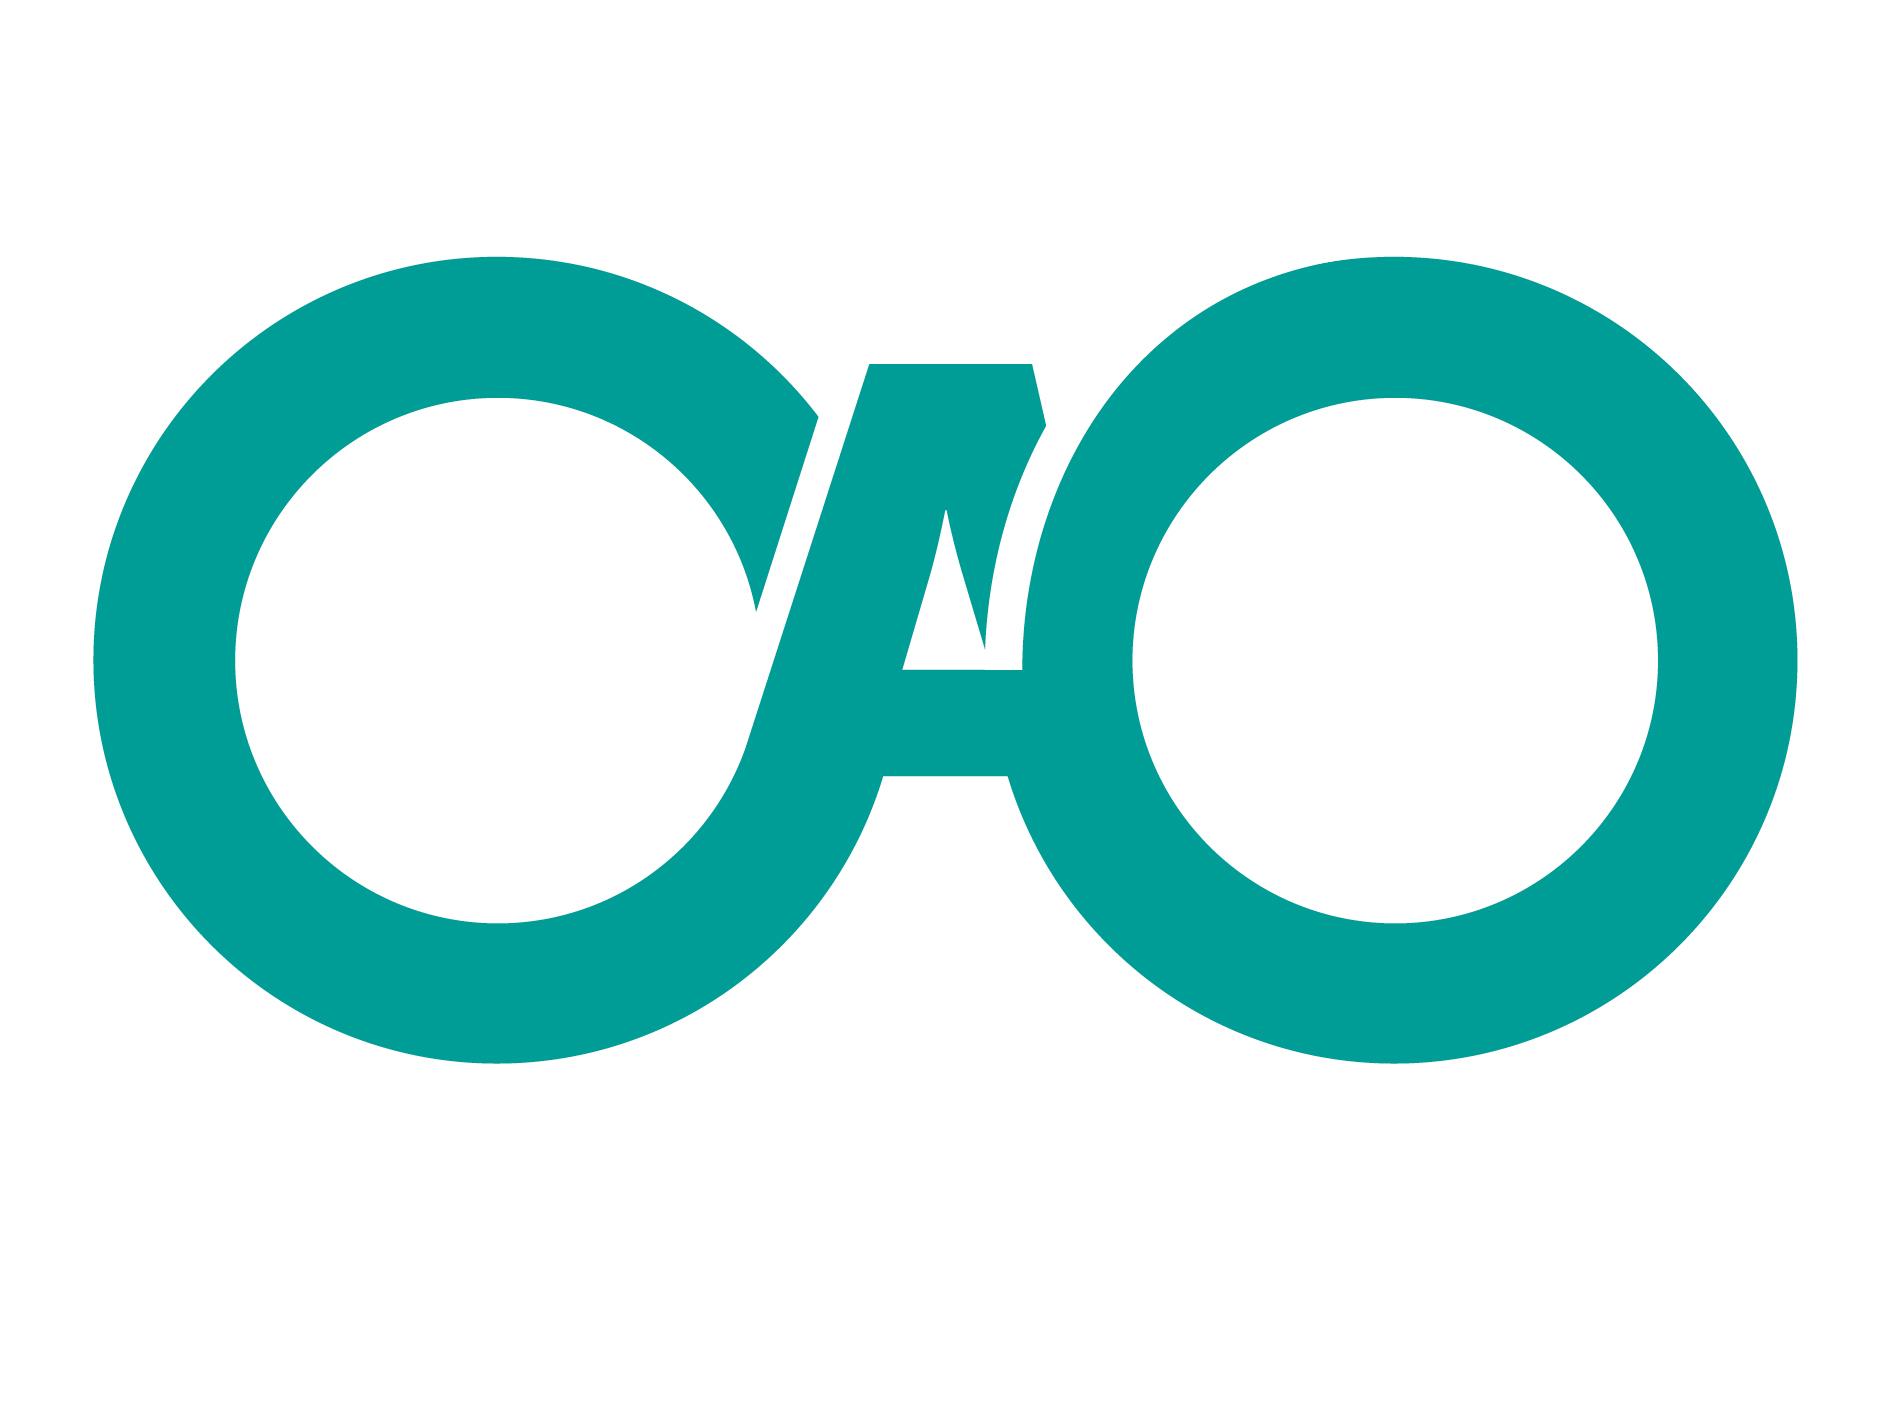 cao-kijker logo